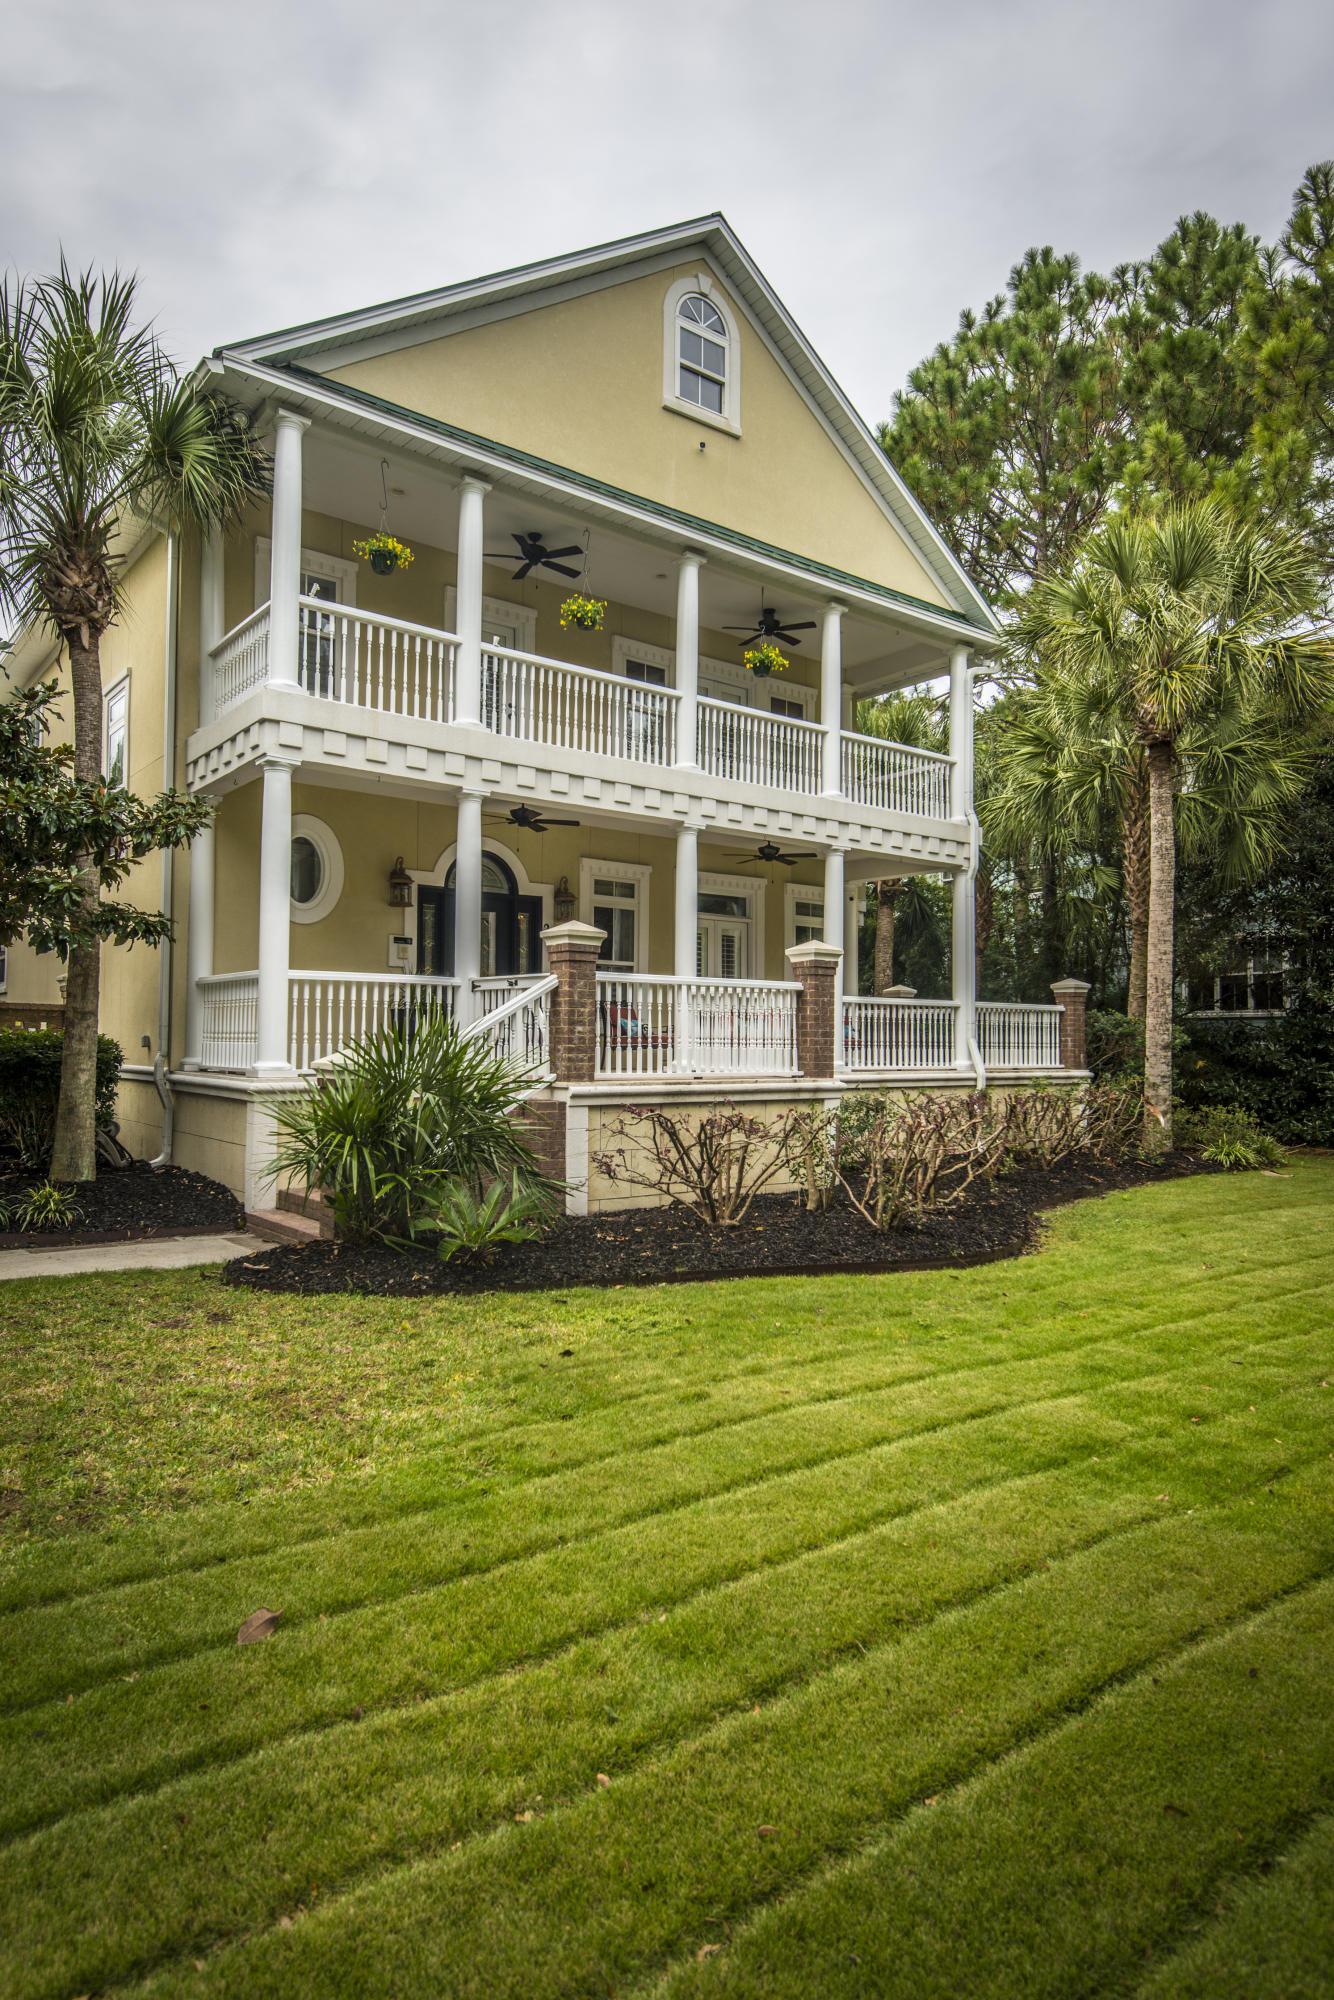 Back Bay Village Homes For Sale - 281 Indigo Bay, Mount Pleasant, SC - 1